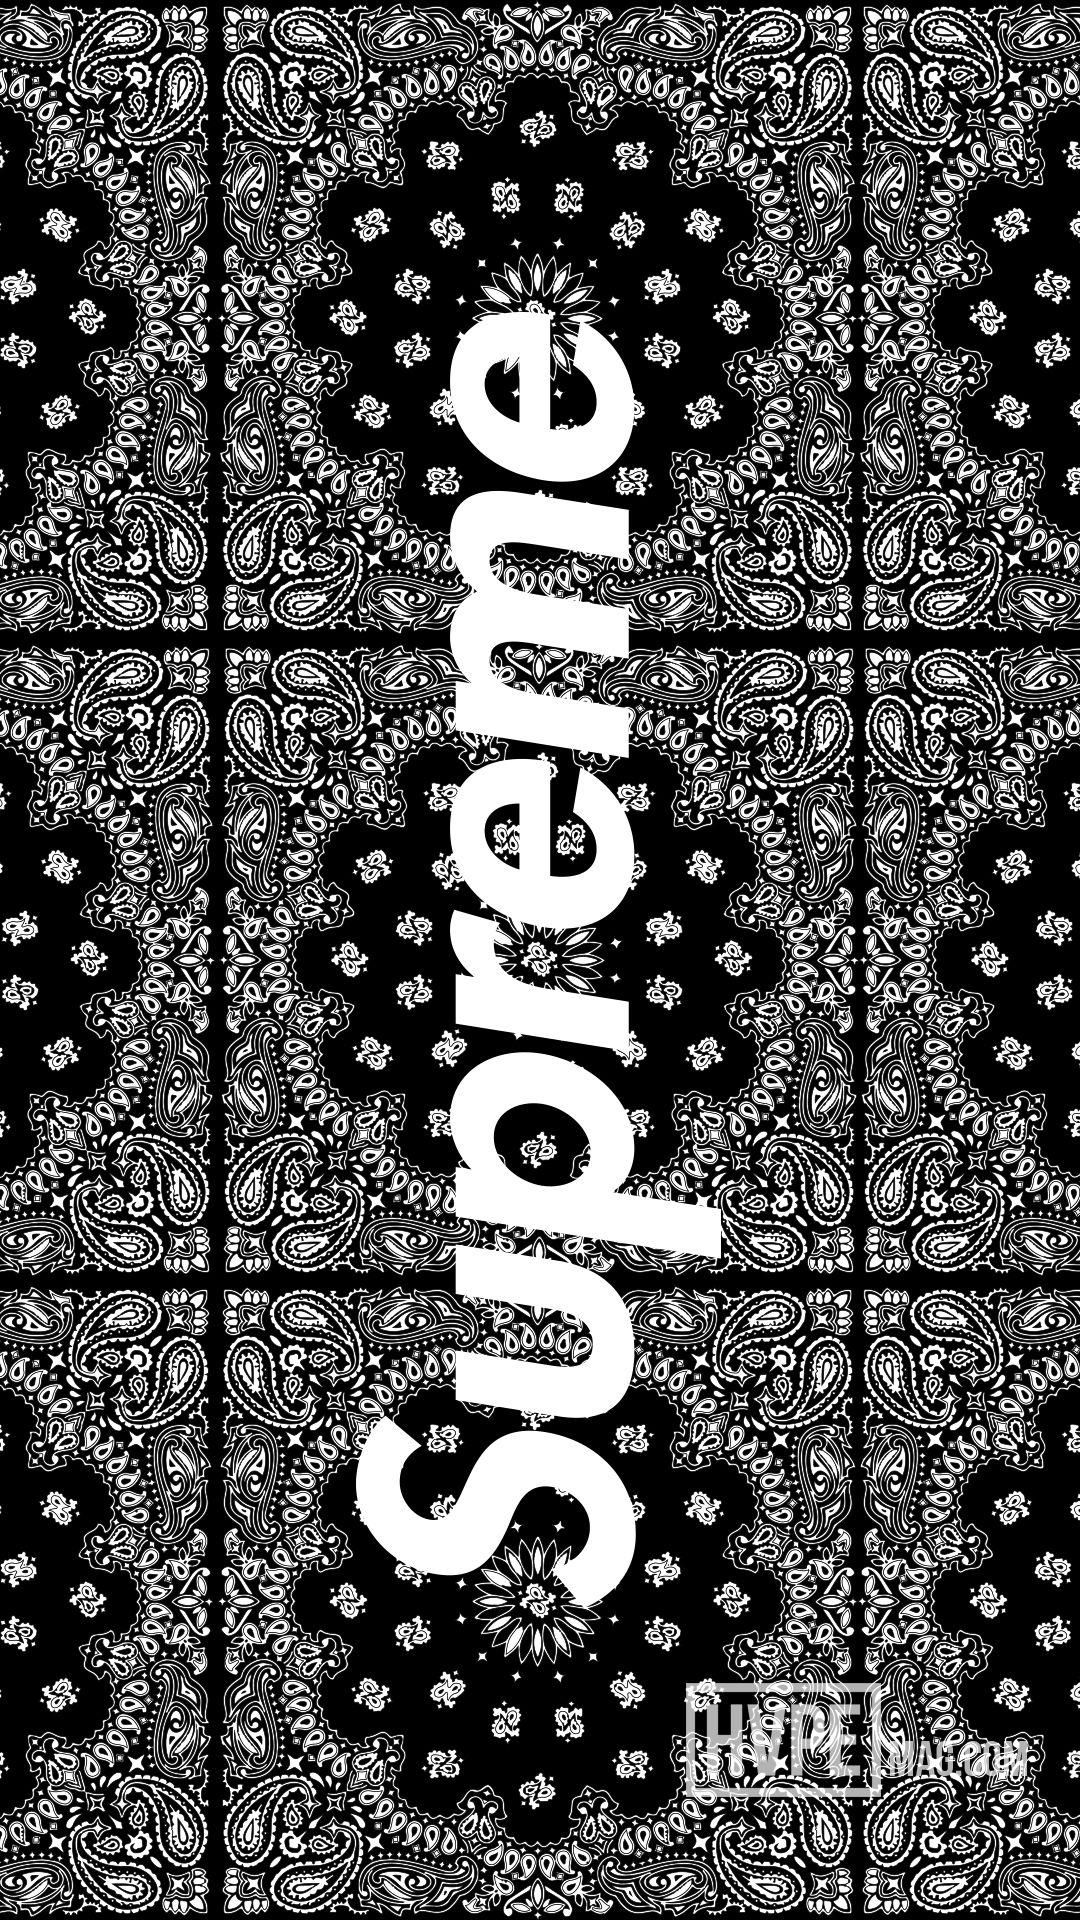 Supreme black 壁紙, 壁紙ダウンロード, Iphone壁紙